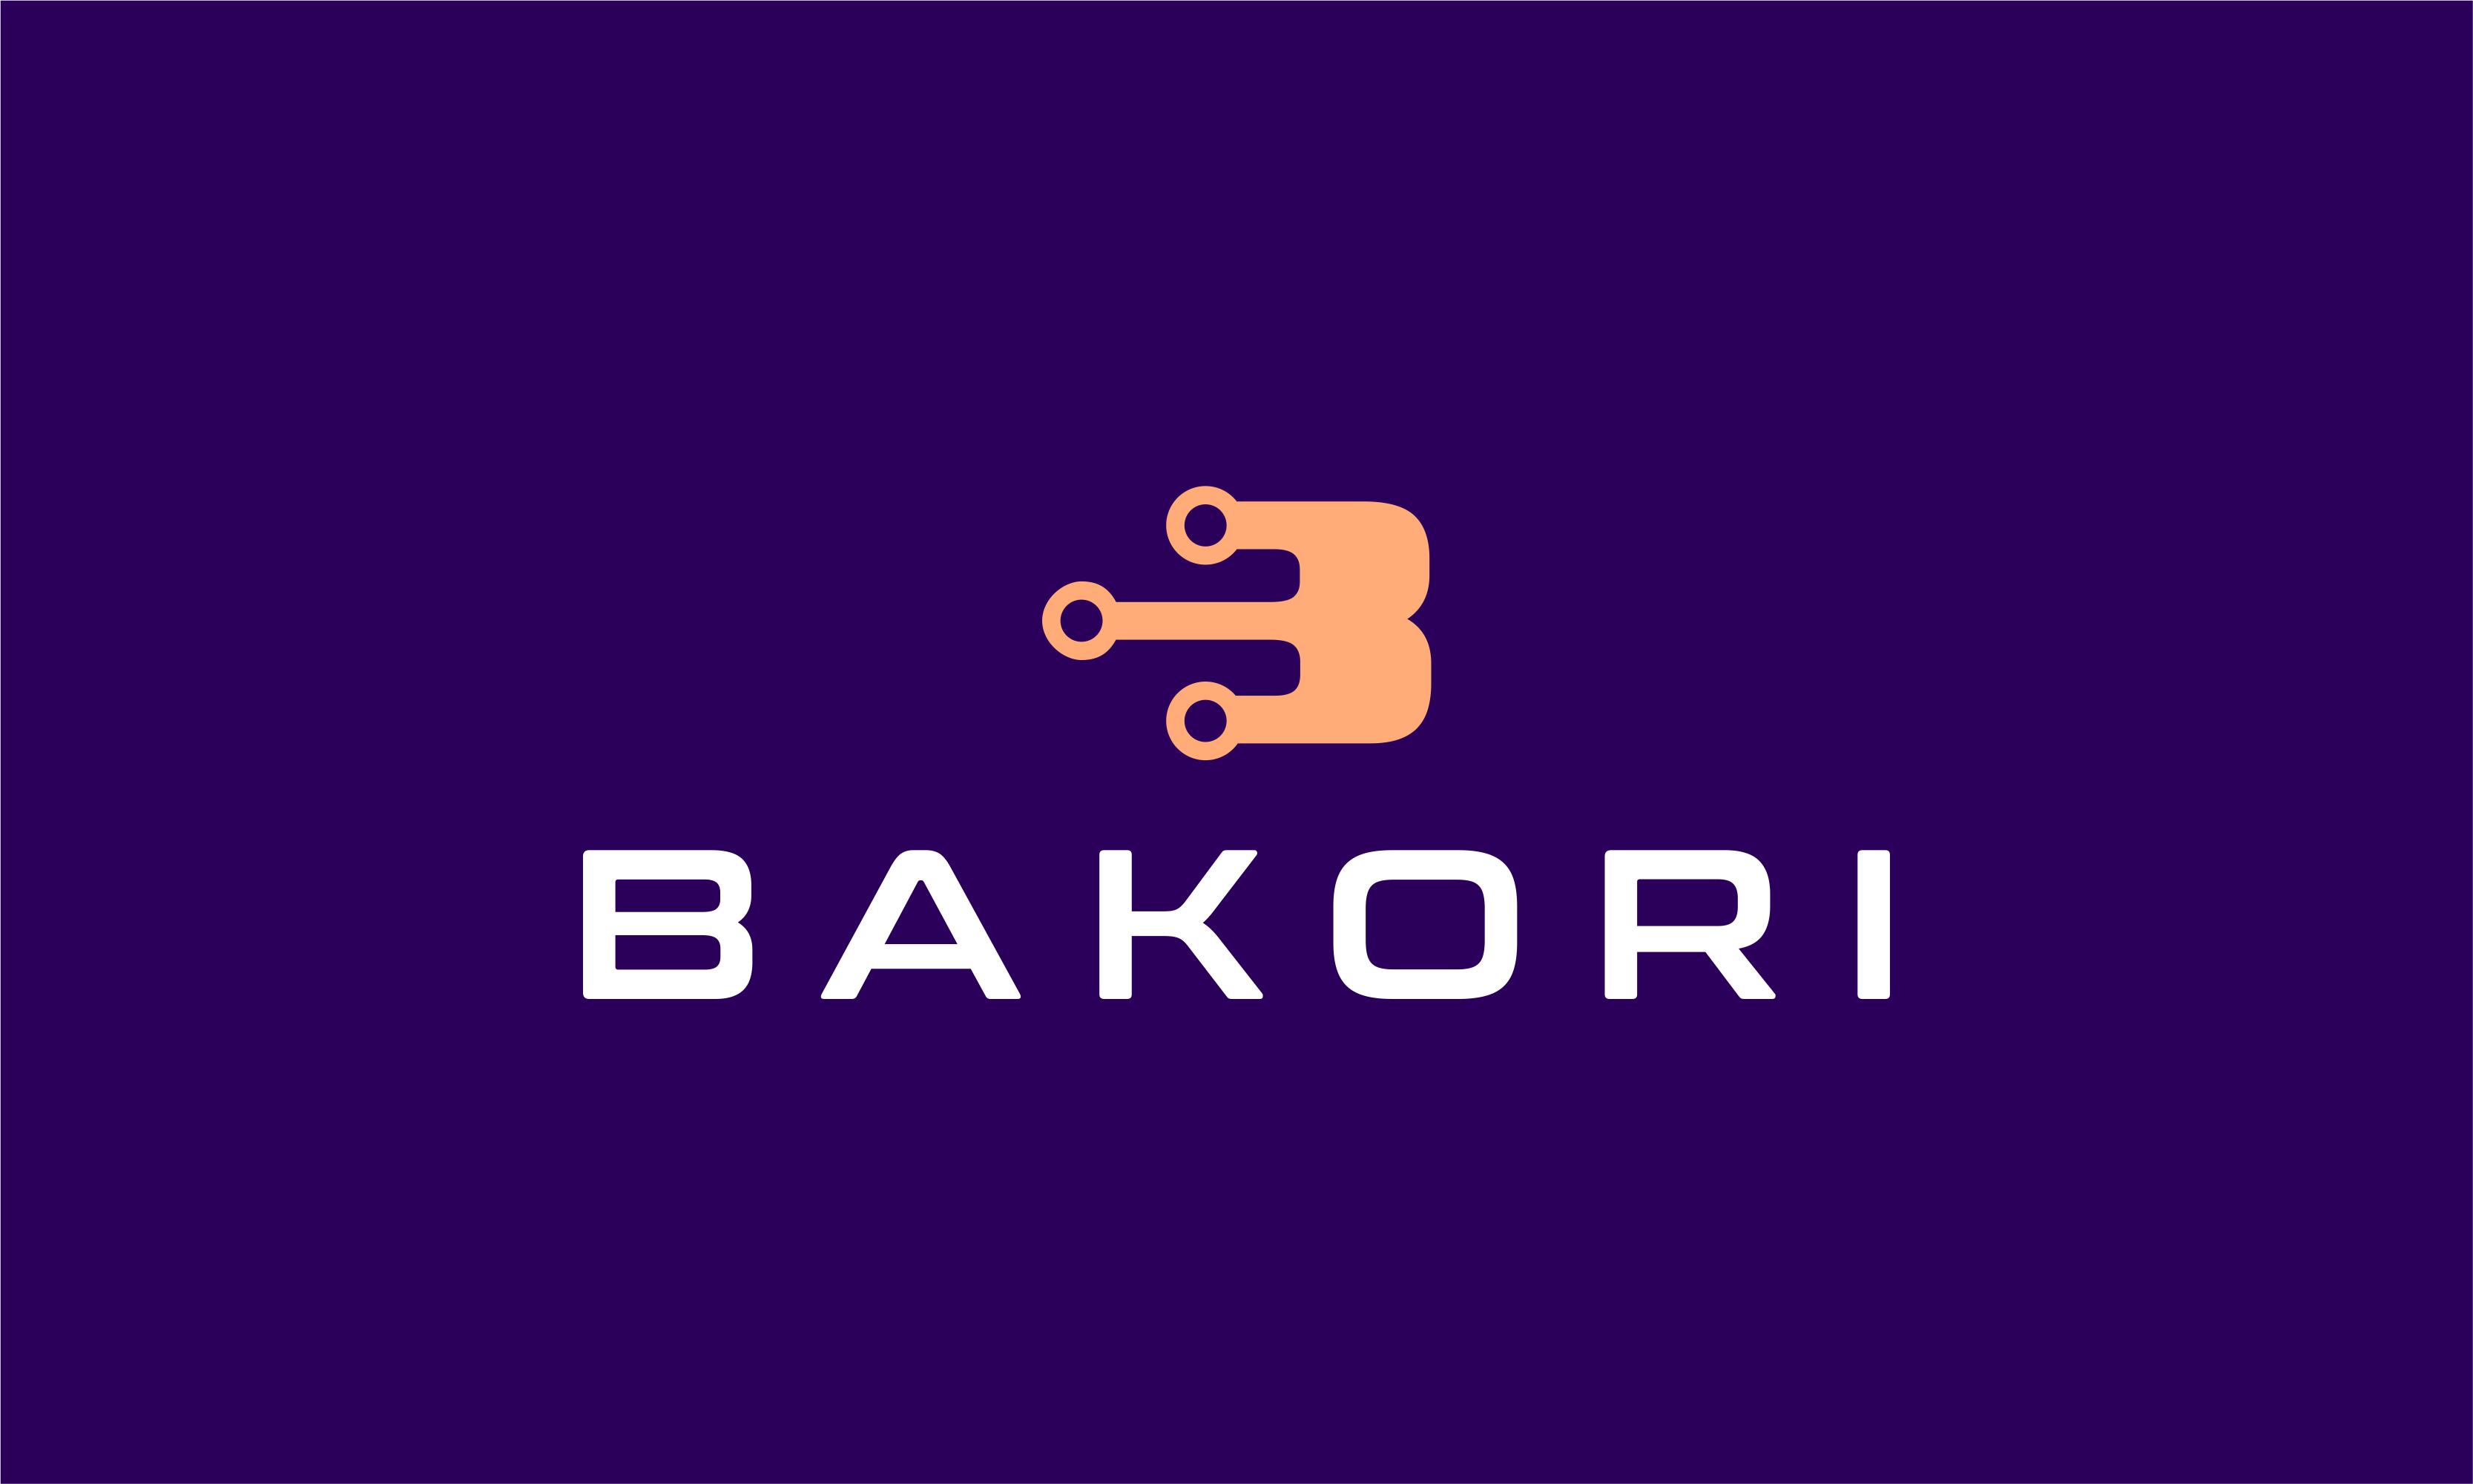 Bakori